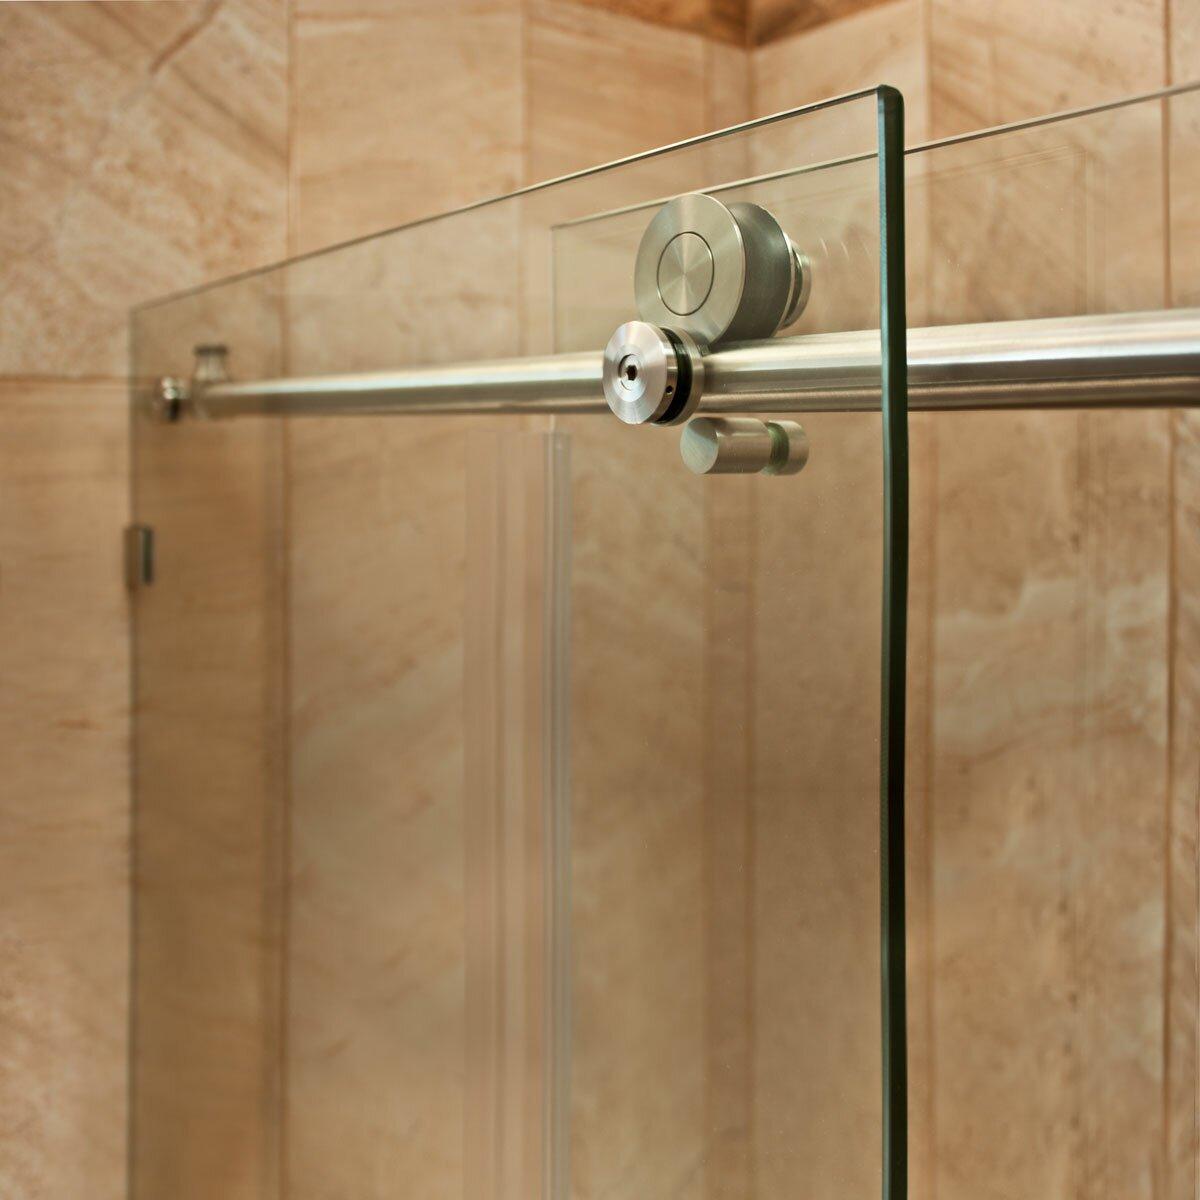 Lesscare ultra c 62 x 60 sliding glass bath tub door for Sliding glass doors tub